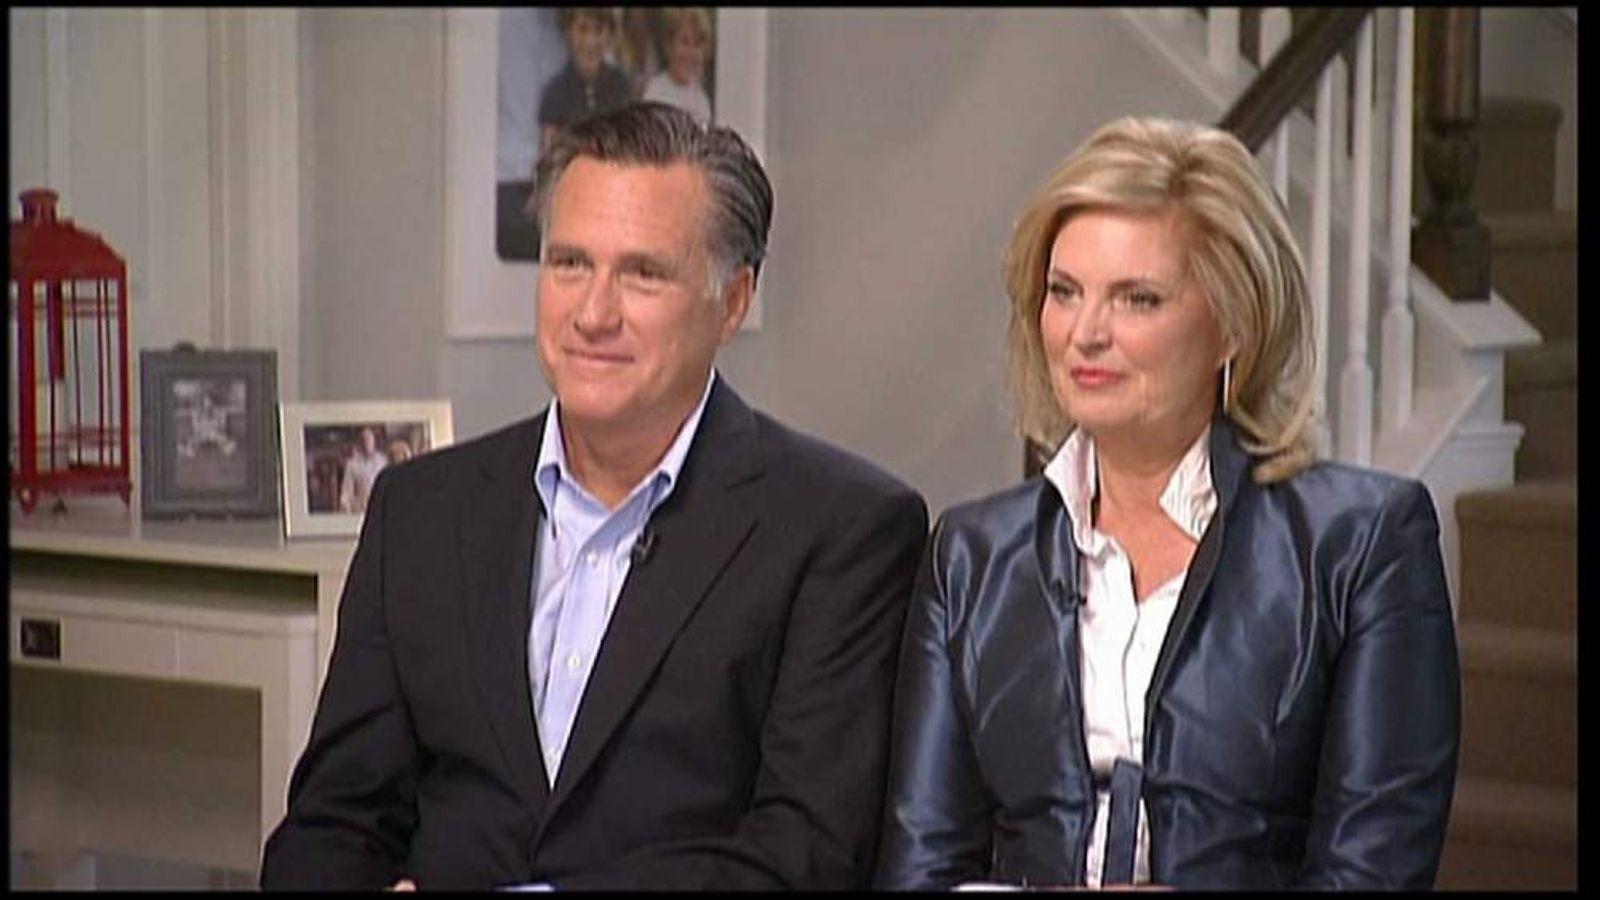 Mitt Romney makes public appearance on election defeat